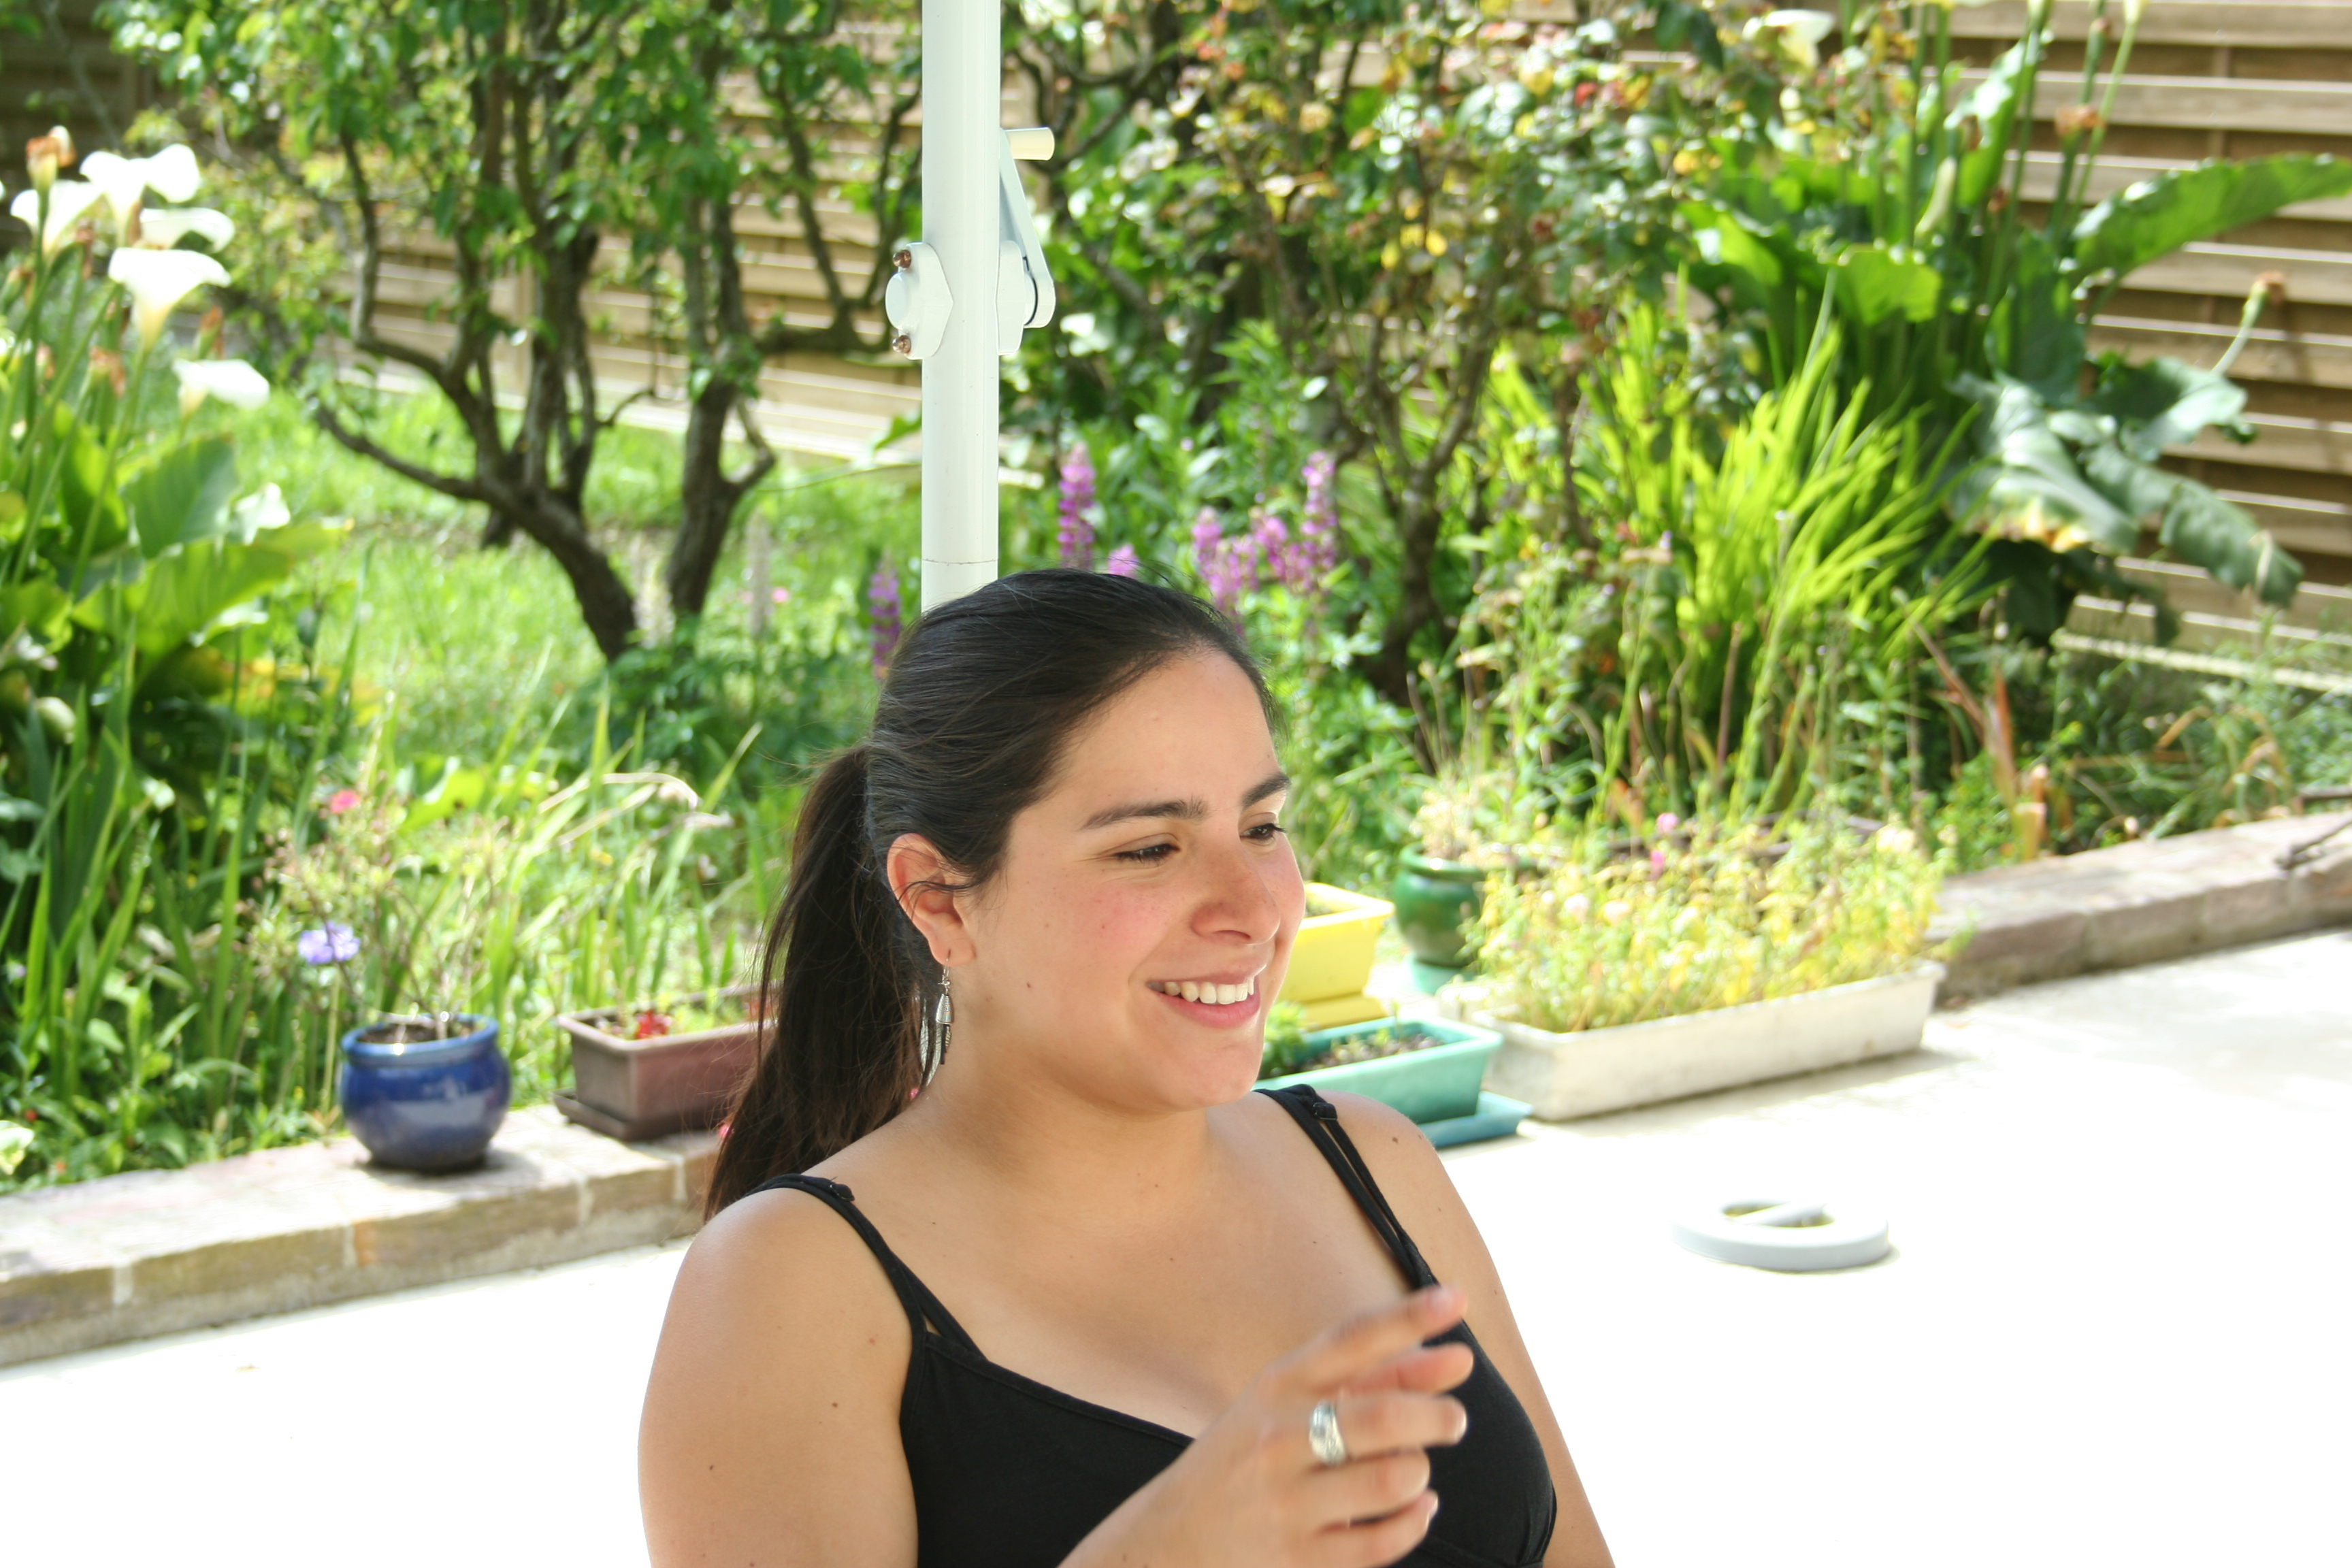 Paula incarne une jeunesse mondiale qui s'indigne et s'engage